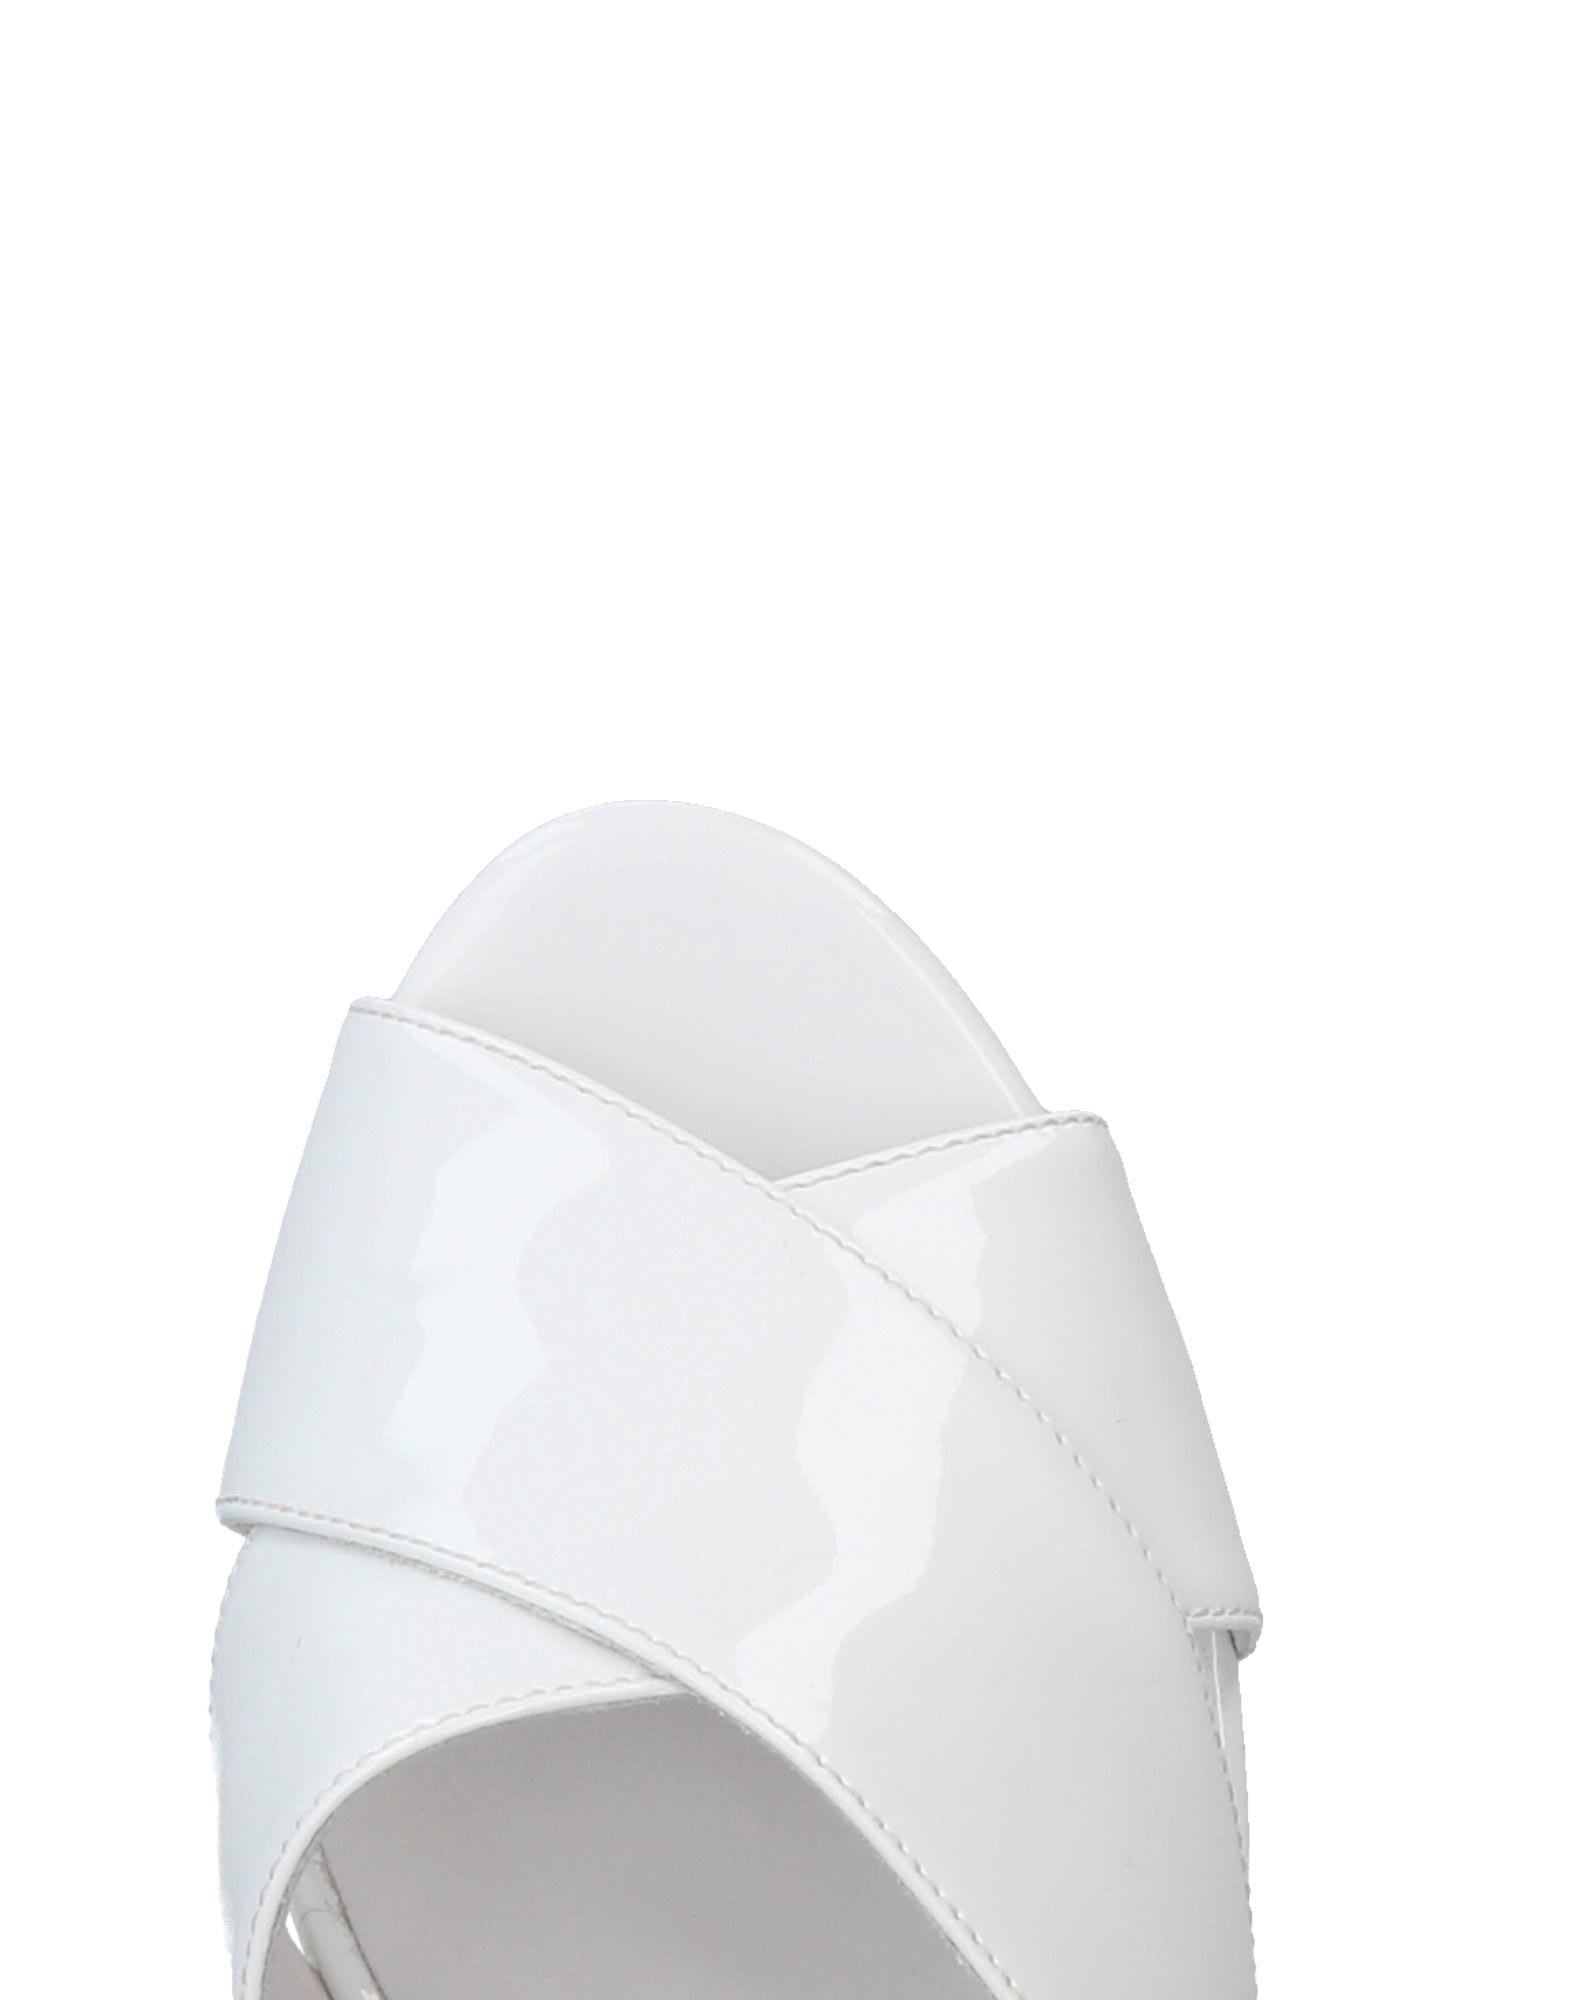 Stilvolle billige Schuhe Hogan Sandalen Sandalen Sandalen Damen 11382522JC f3aa03